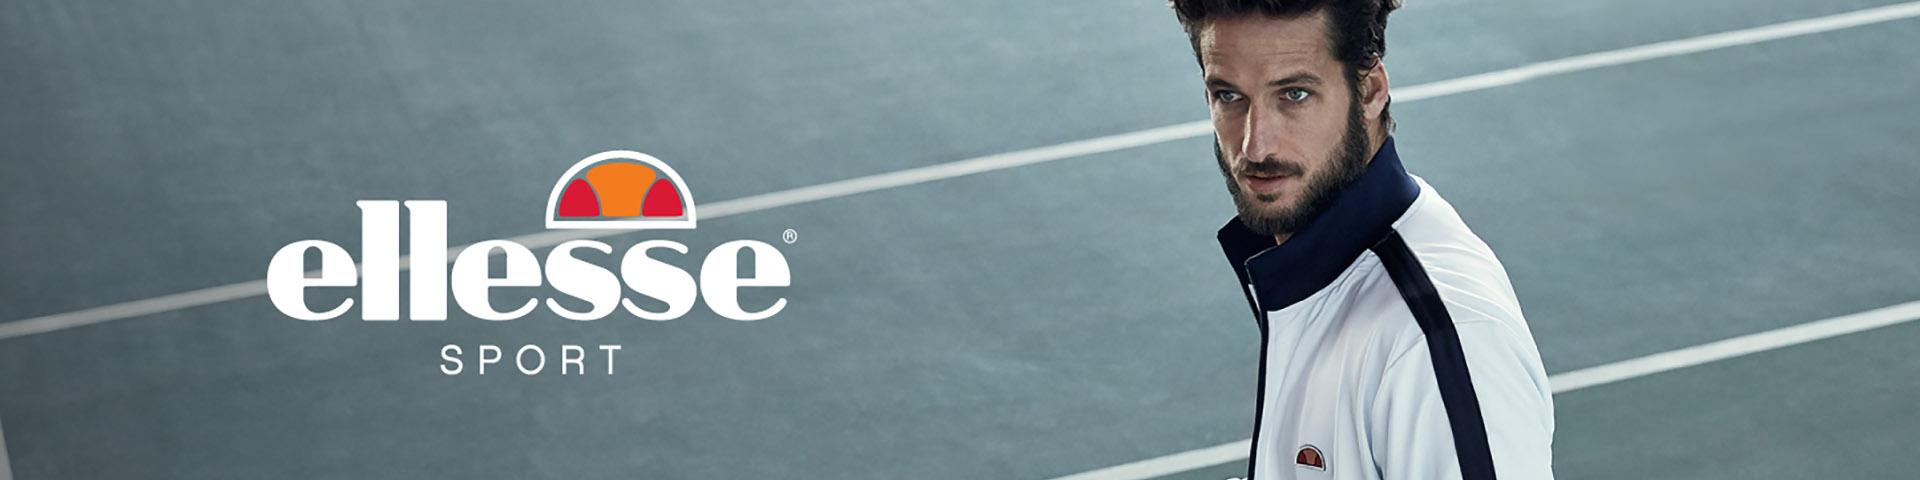 Ellesse-mens-tennis_1920b